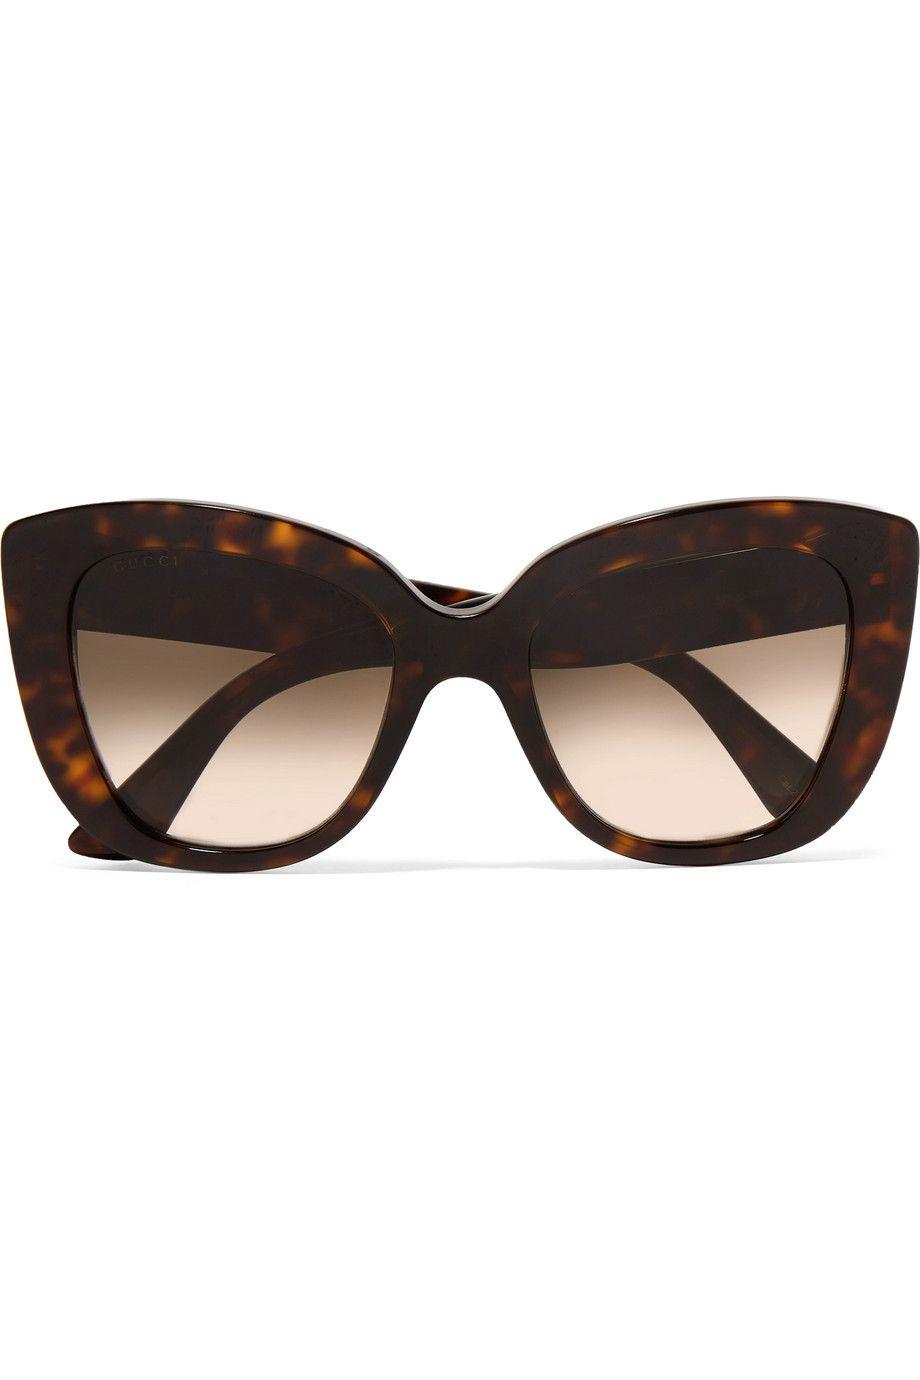 c4fd868453f Gucci | Havana cat-eye tortoiseshell acetate sunglasses | NET-A-PORTER.COM